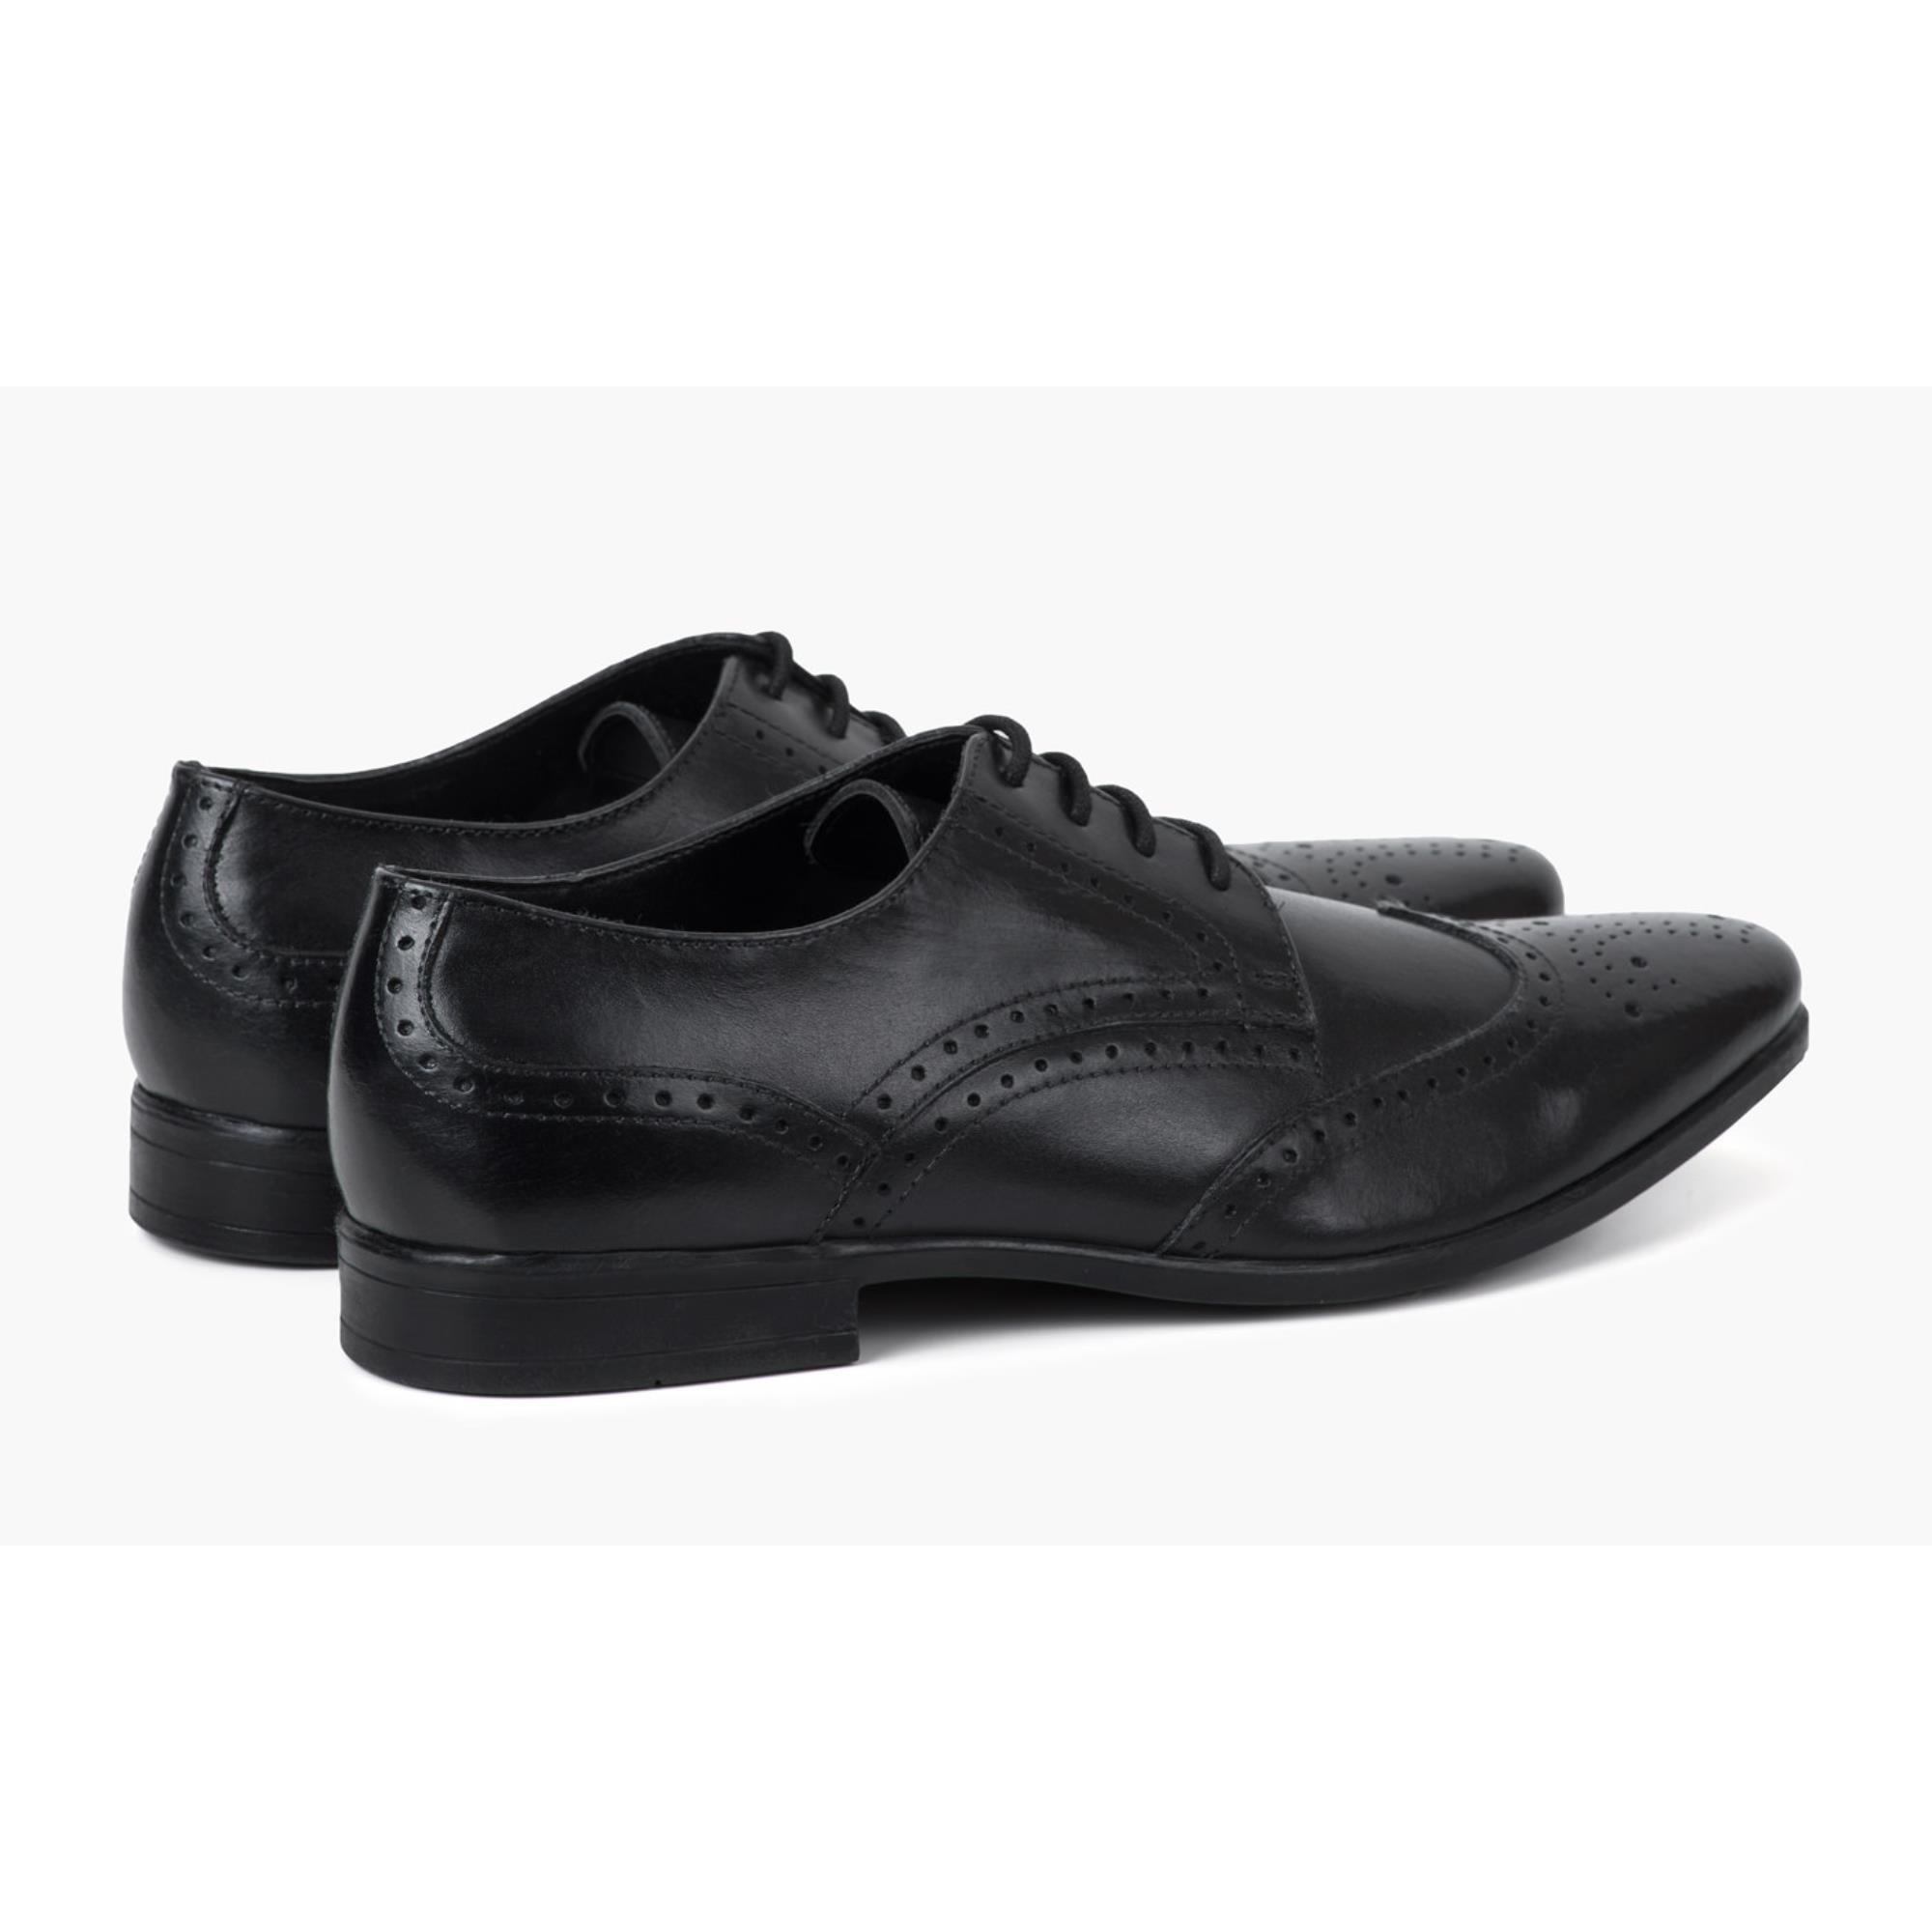 Redfoot Jenson Black Leather Brogue Shoe